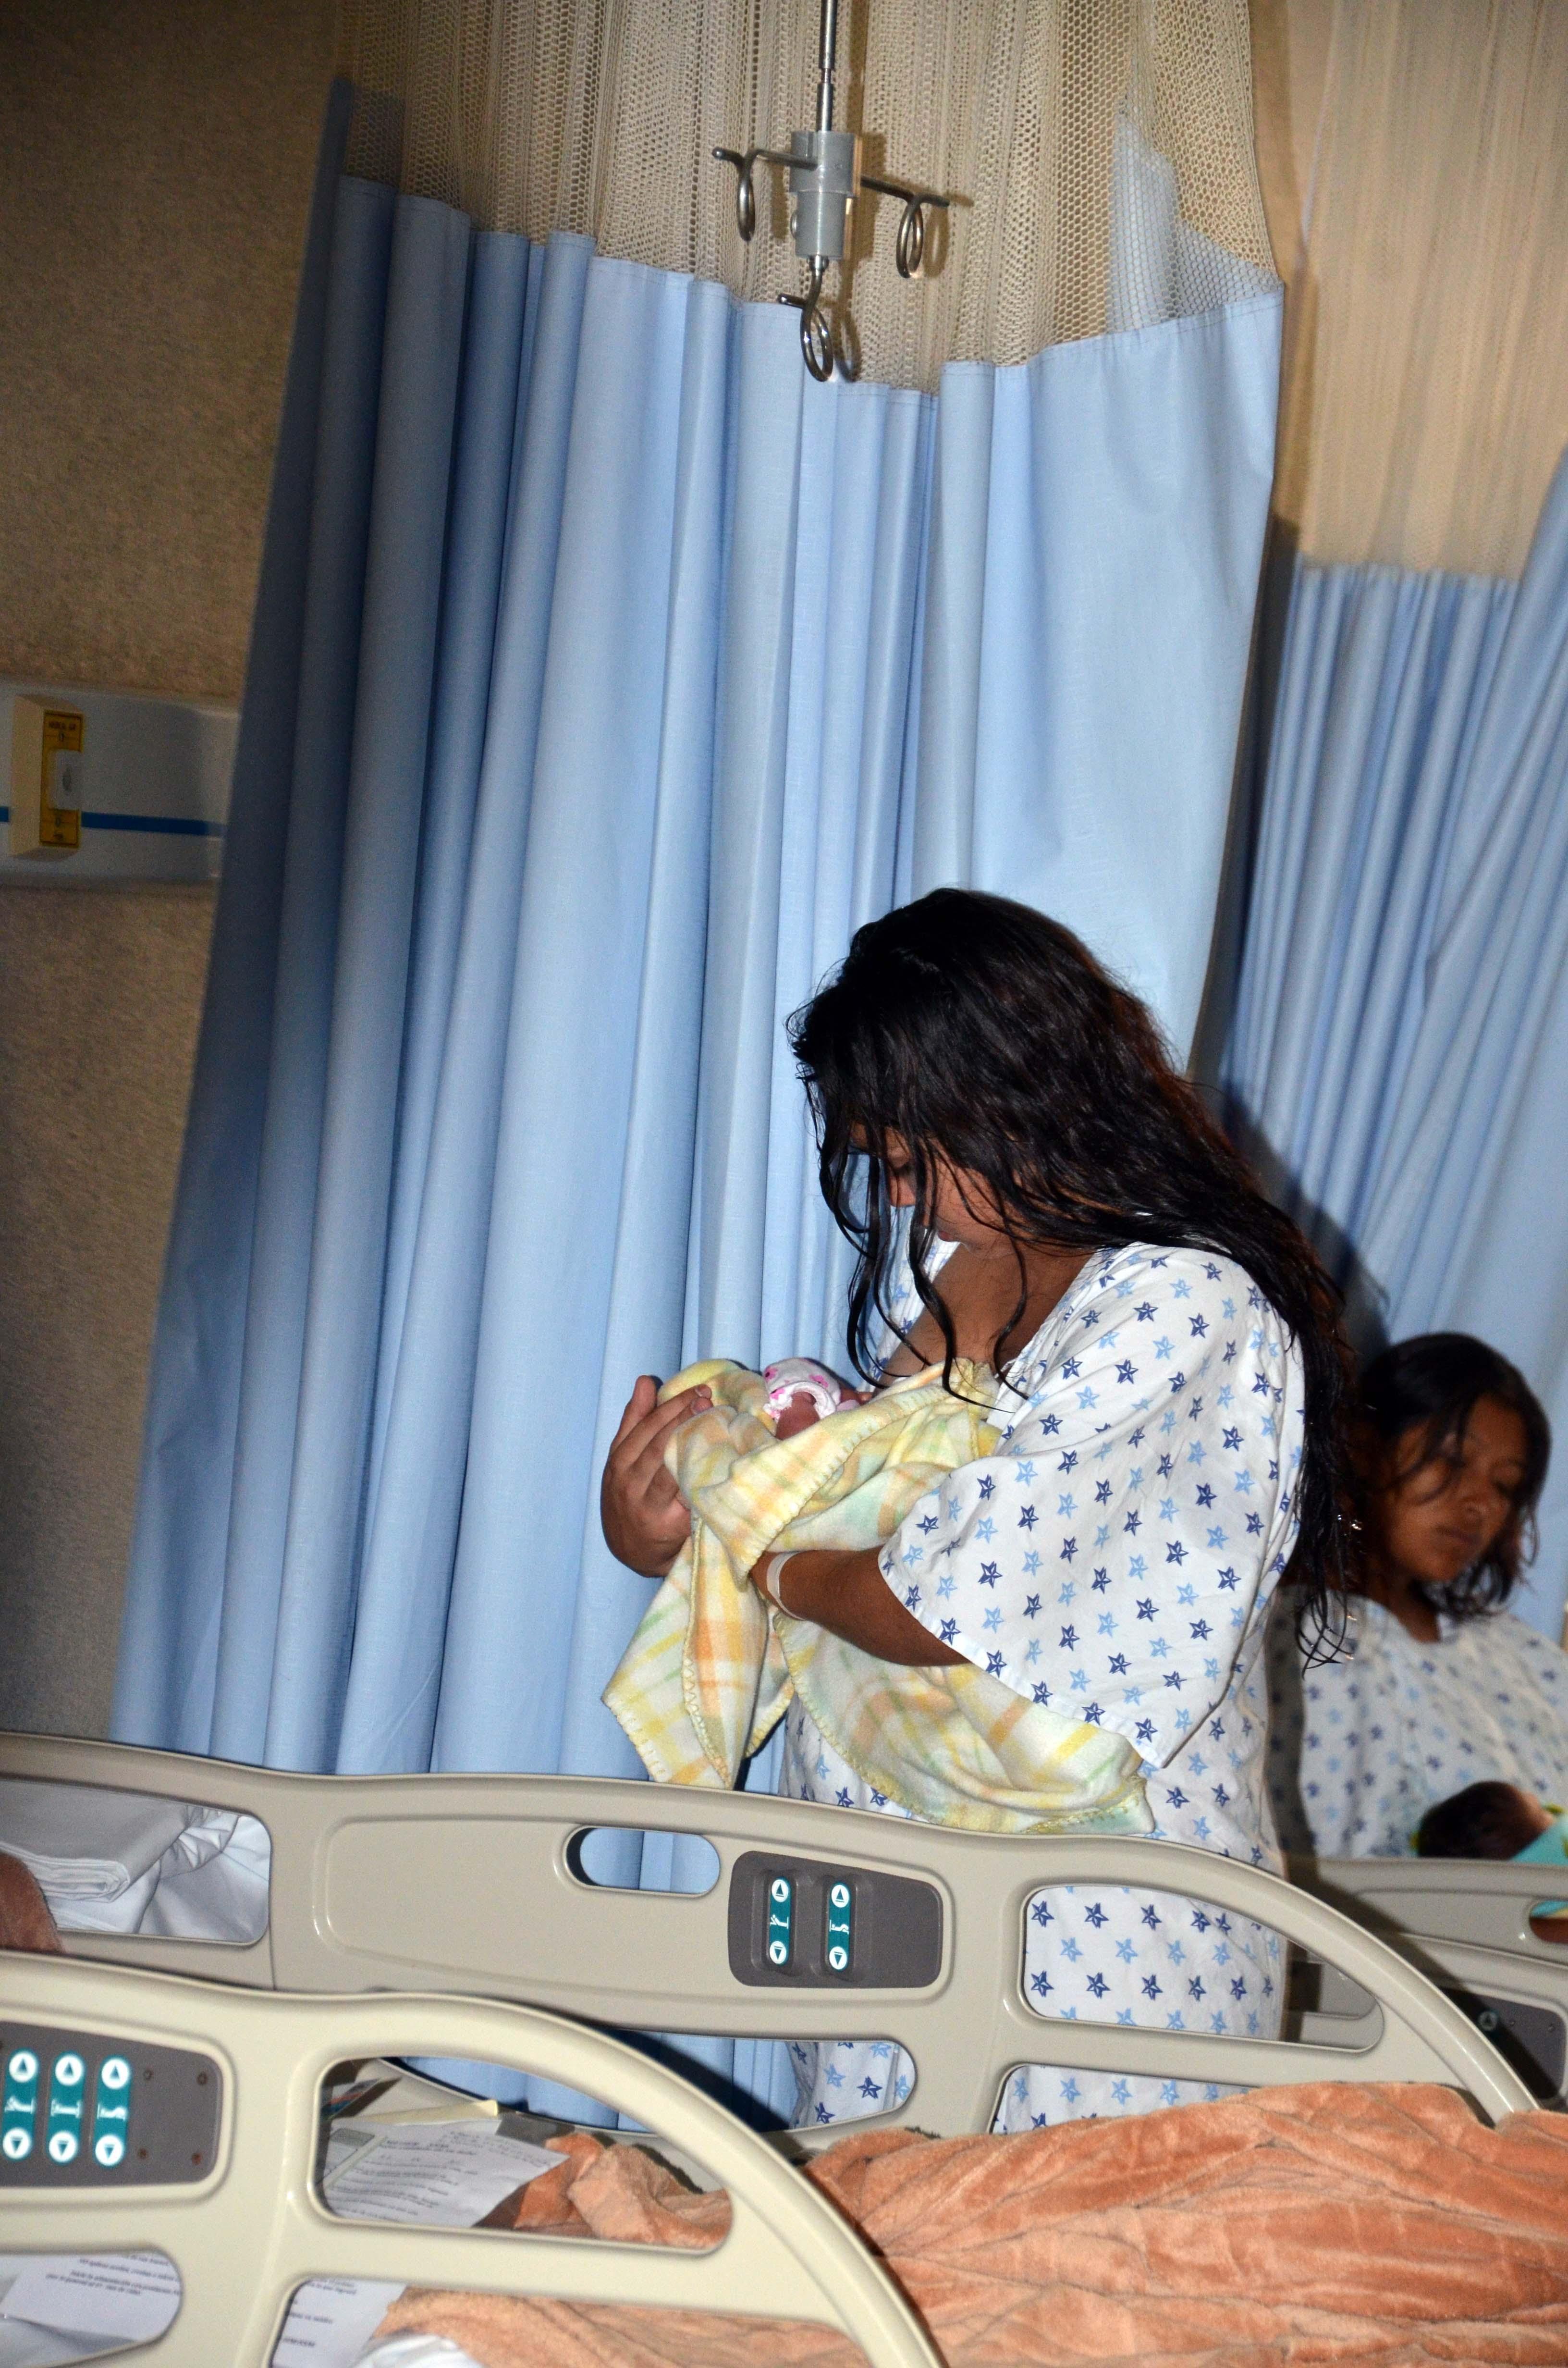 lactancia materna2jpg